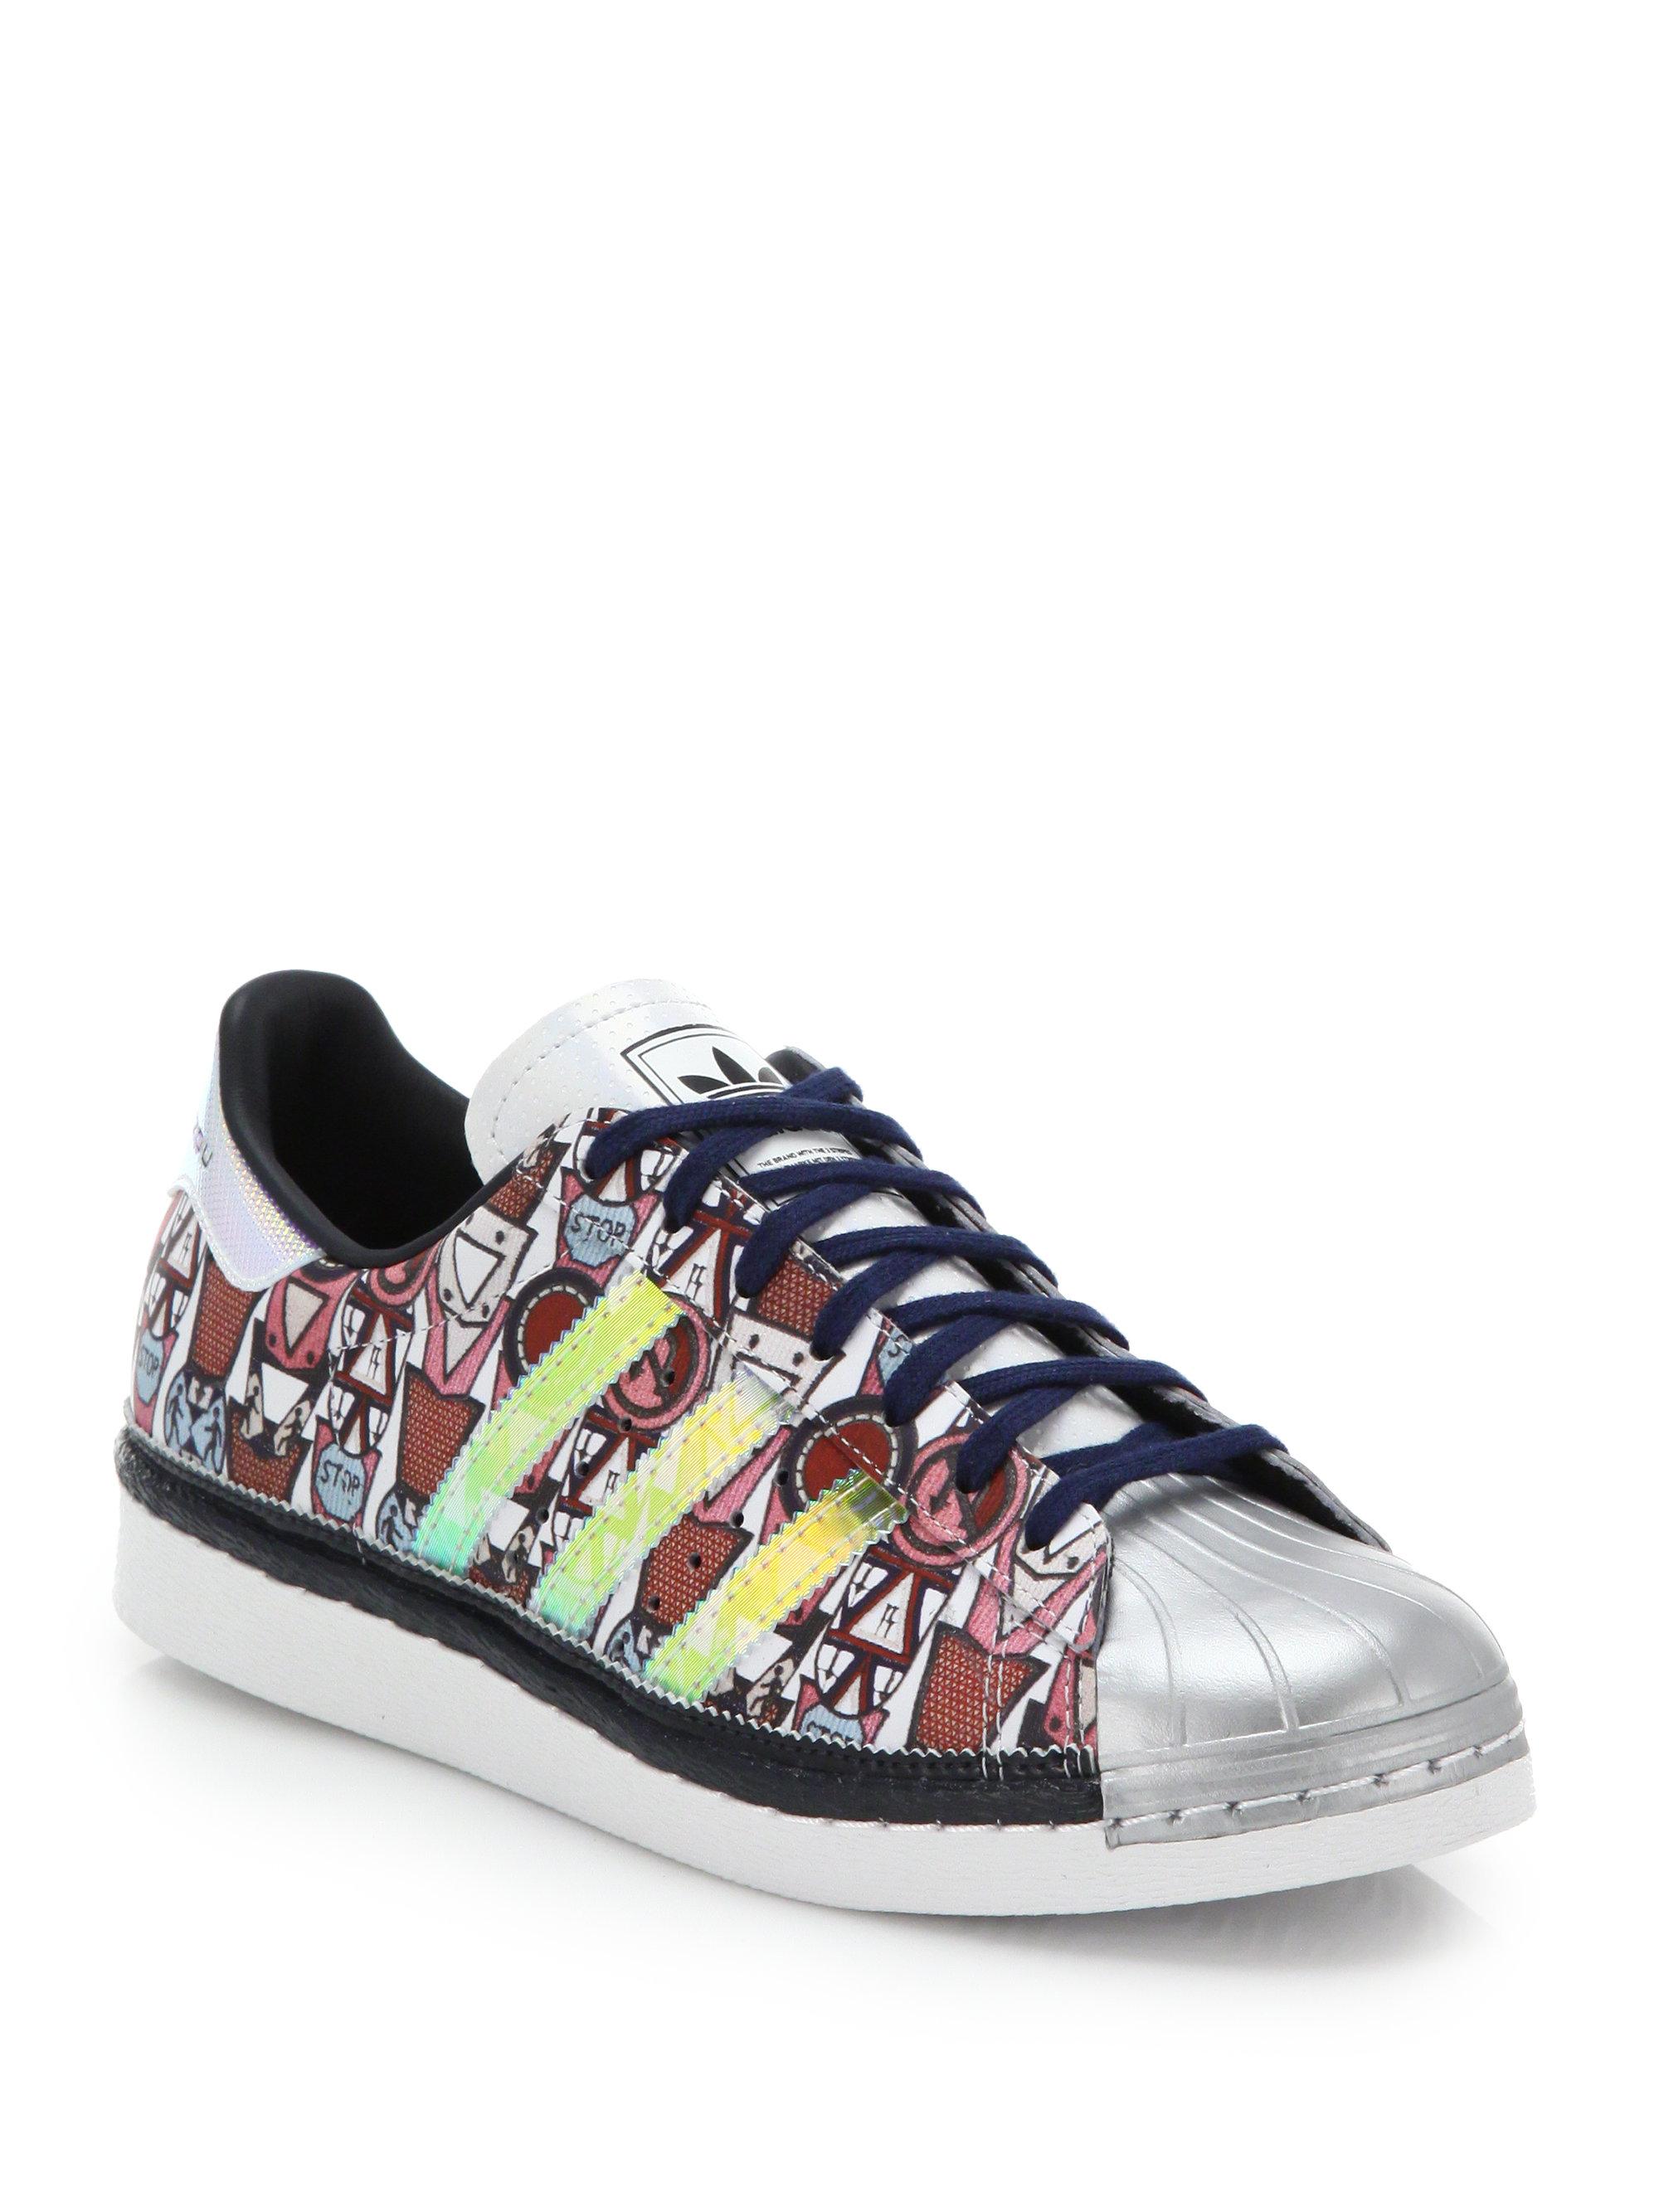 Lyst - adidas Originals Badge-print Shell-toe Sneakers in Gray 9e5de0fab